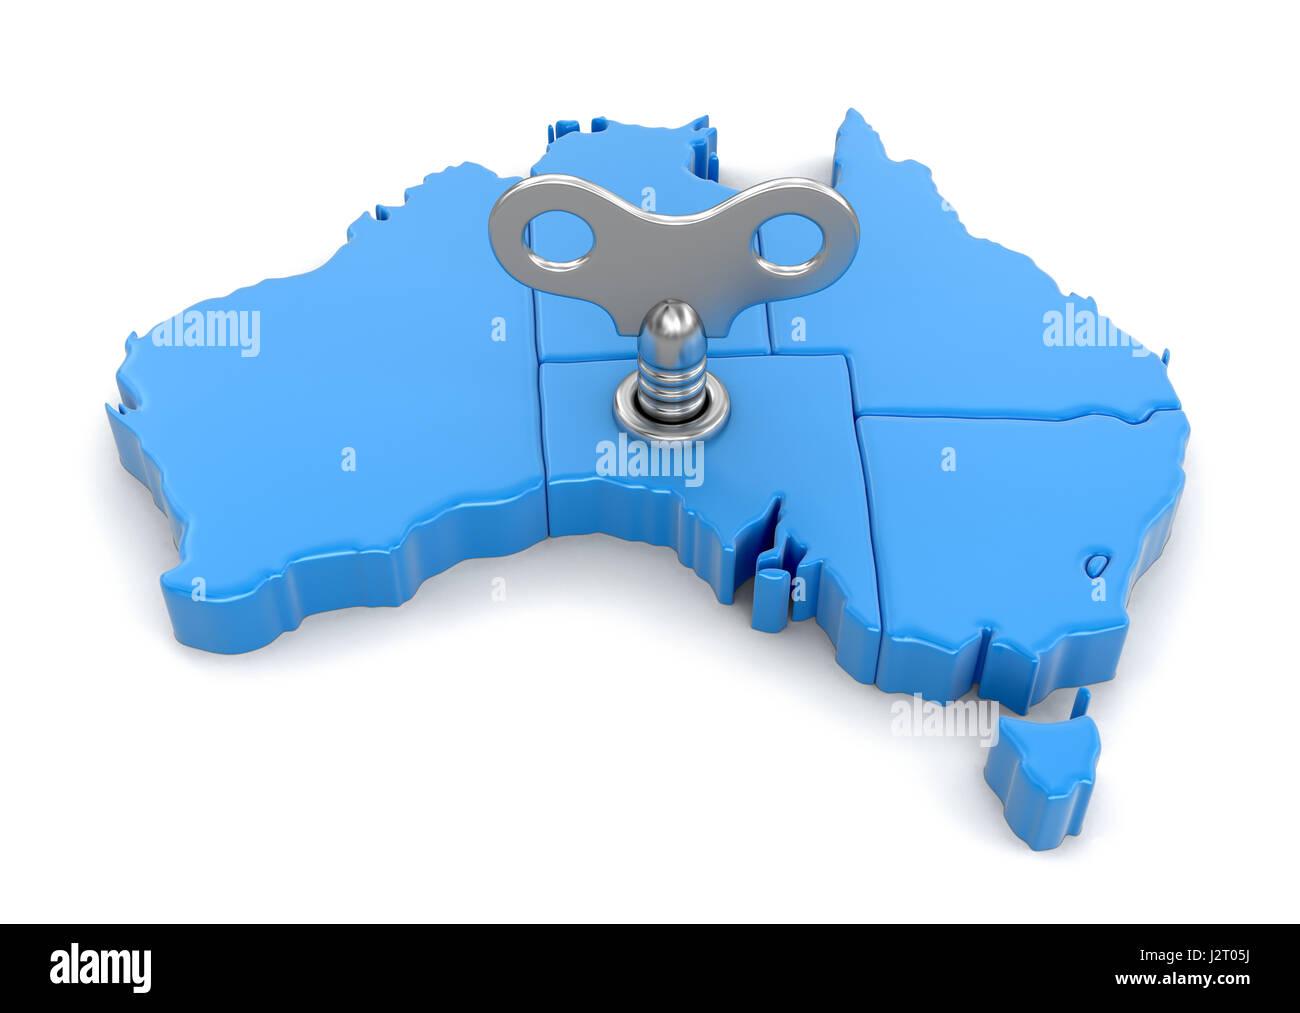 Key With Map Australia on iraq map with key, south dakota map with key, lebanon map with key, honduras map with key, middle east map with key, belgium map with key, liberia map with key, alaska map with key, ancient egypt map with key, map of usa with key, ancient greece map with key, armenia map with key, albania map with key, new york map with key, washington state map with key, iceland map with key, iran map with key, portugal map with key, south asia map with key, rhode island map with key,